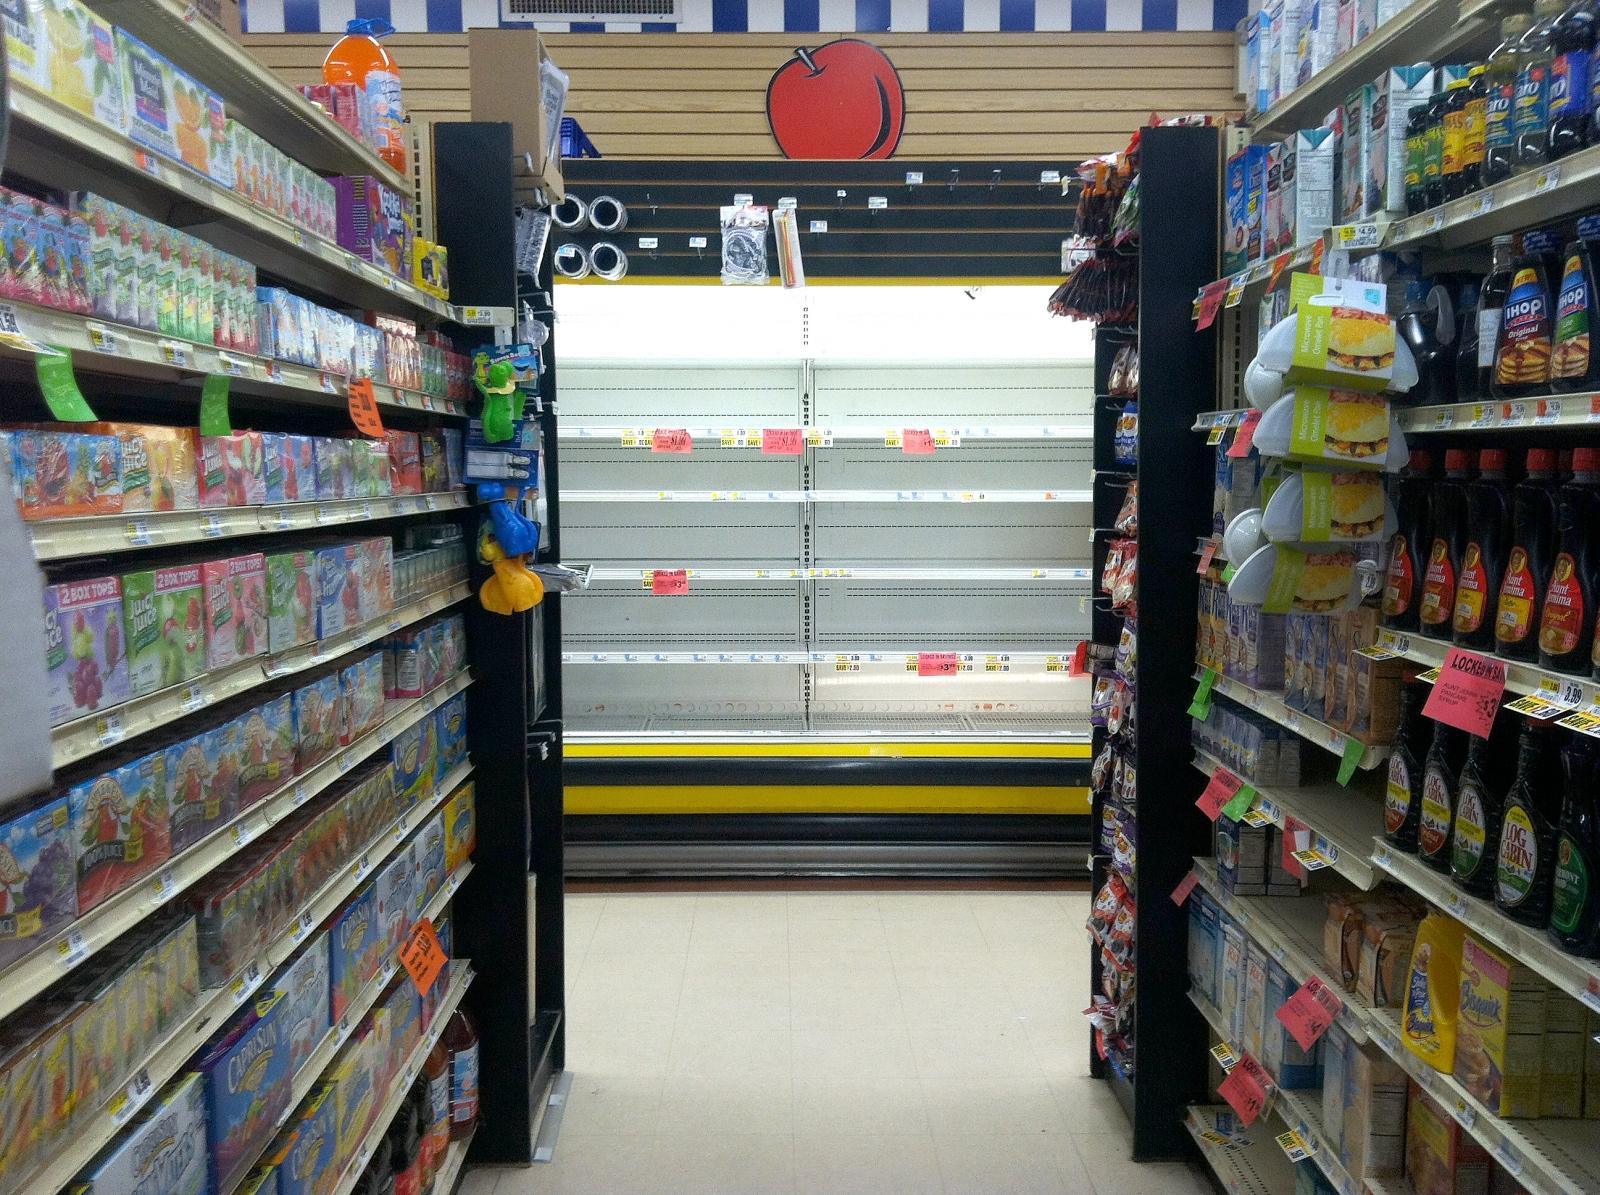 Dairy, Gristedes @ 1st Ave., 4 November / 2012